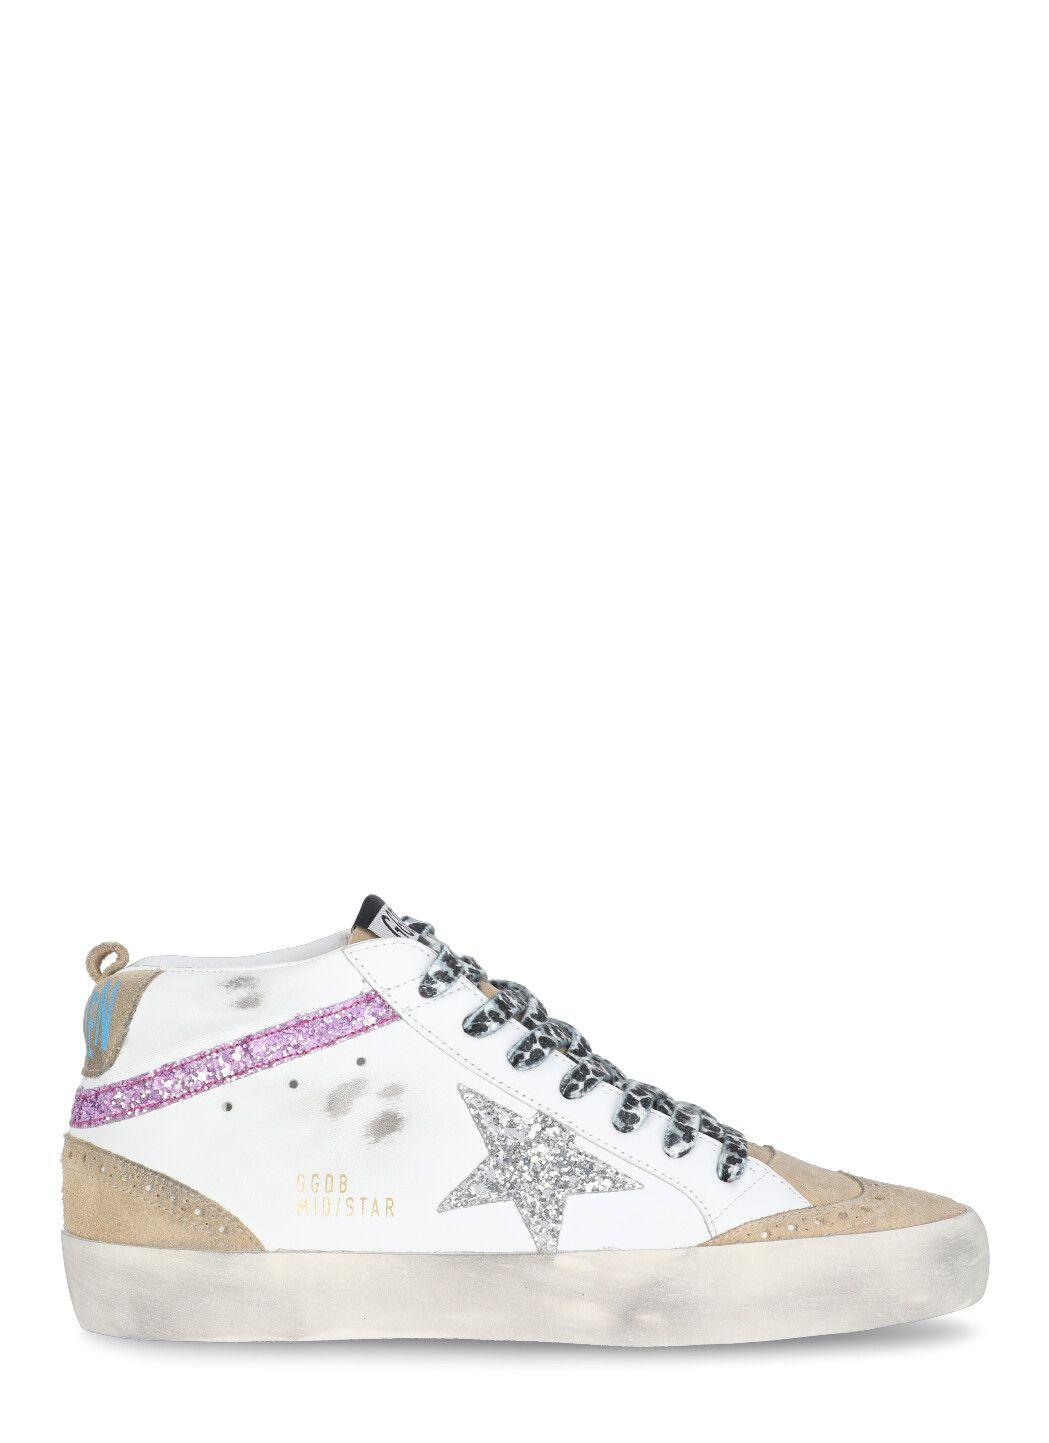 Sneakers Mid Star